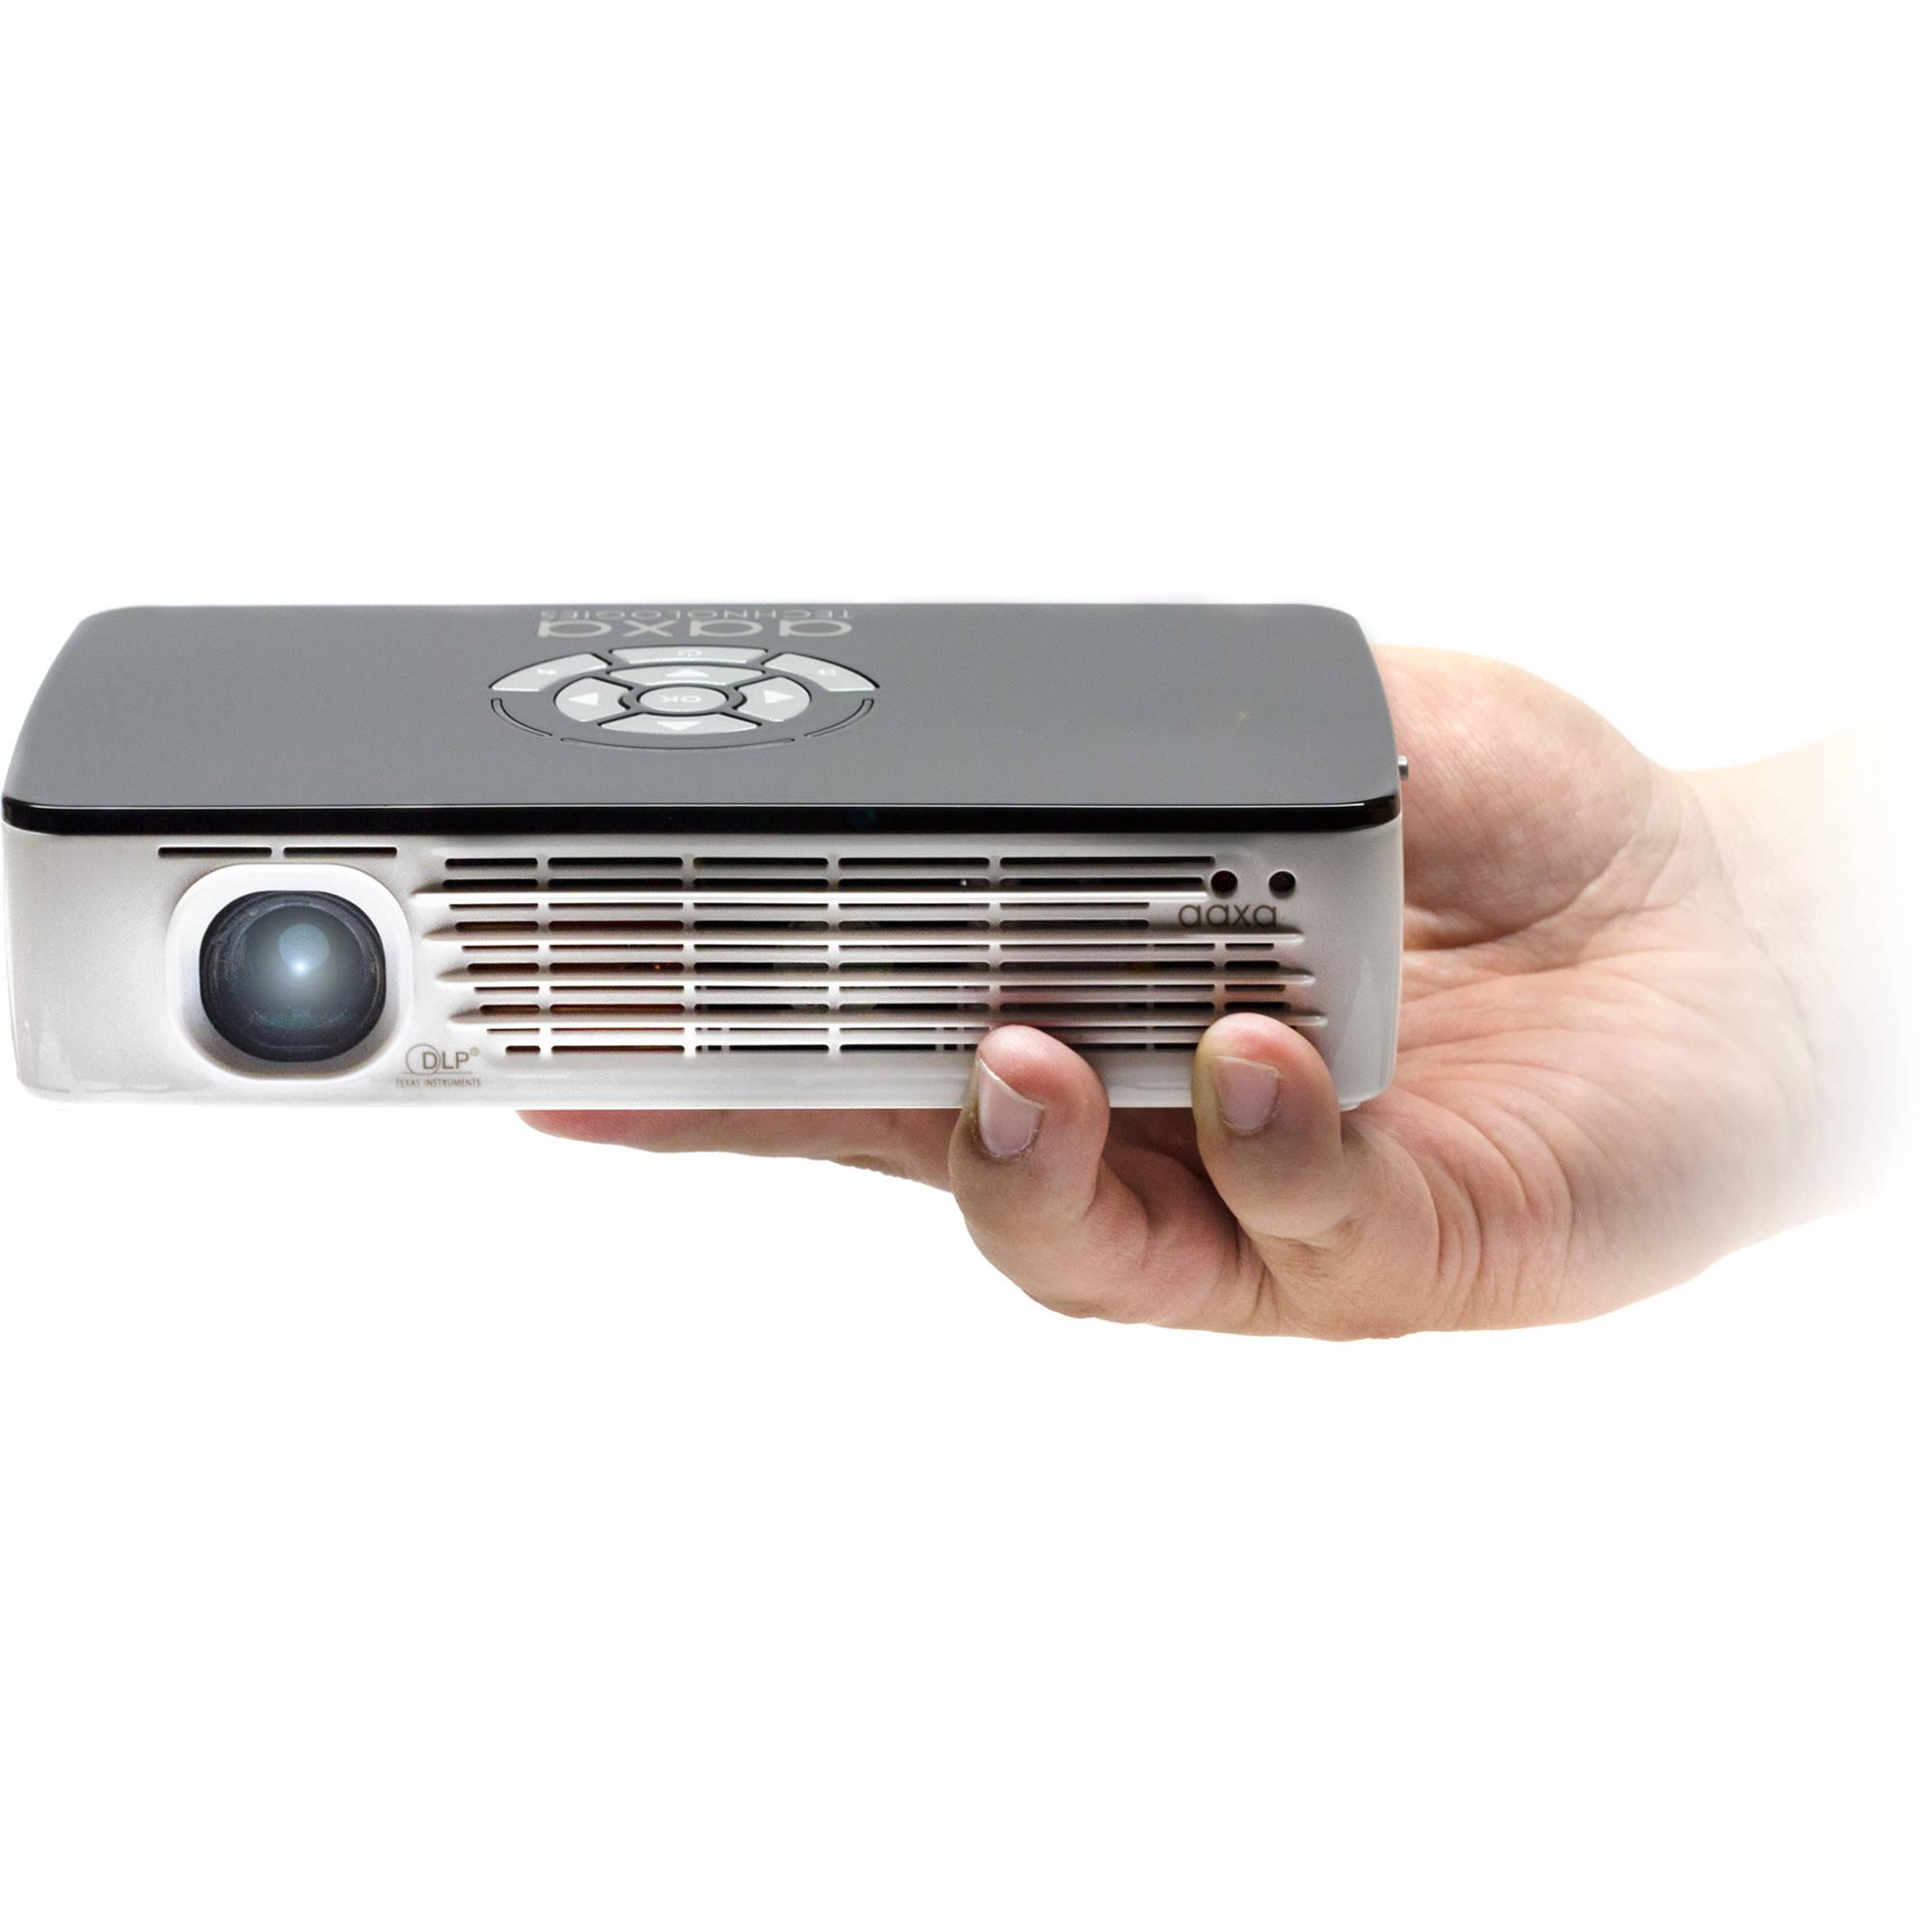 Aaxa technologies p700 pro 650 lumen wxga led pico kp 700 for Pico pro mini projector review